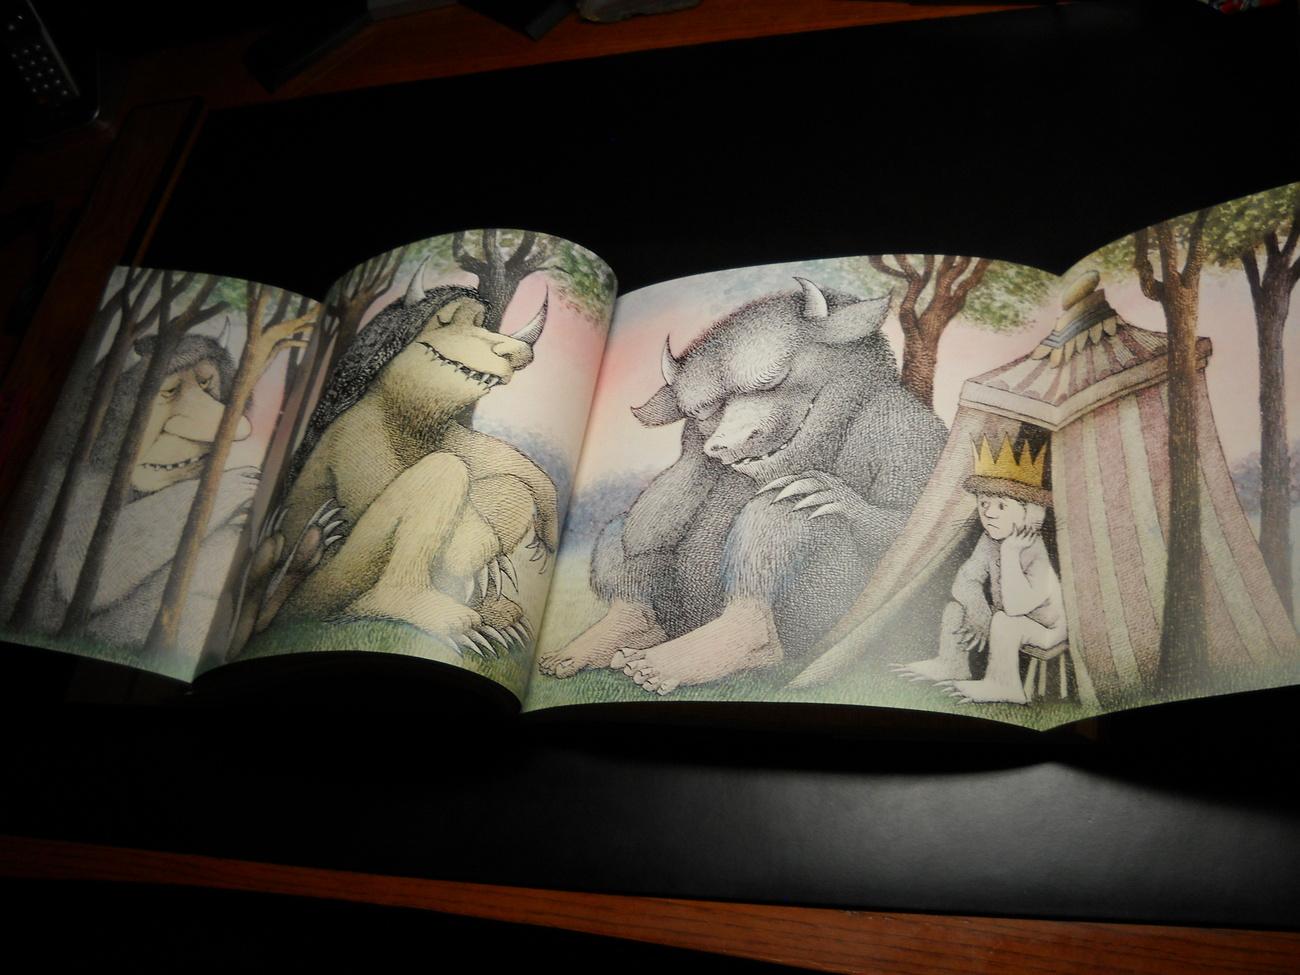 Art of Maurice Sendak by Selma G Lanes 1984 Hard Cover Dust Jacket Abradale